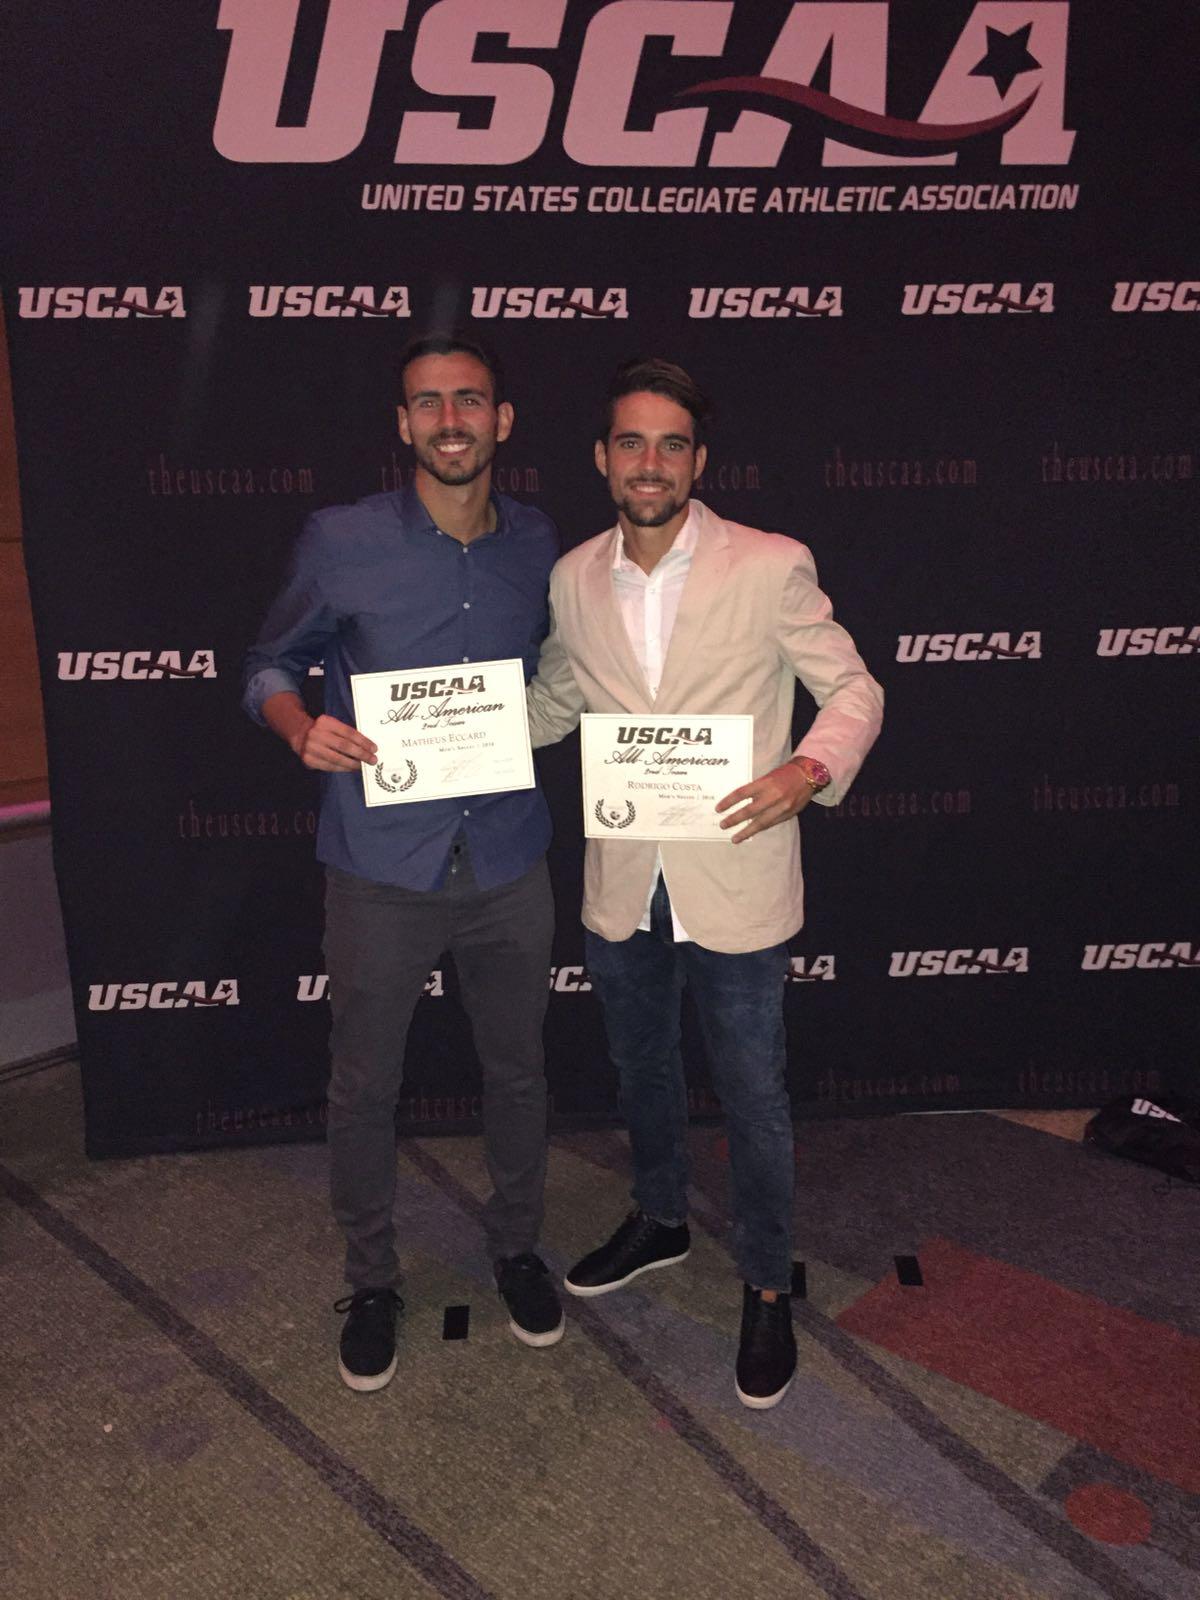 All American Award for Matheus and Rodrigo